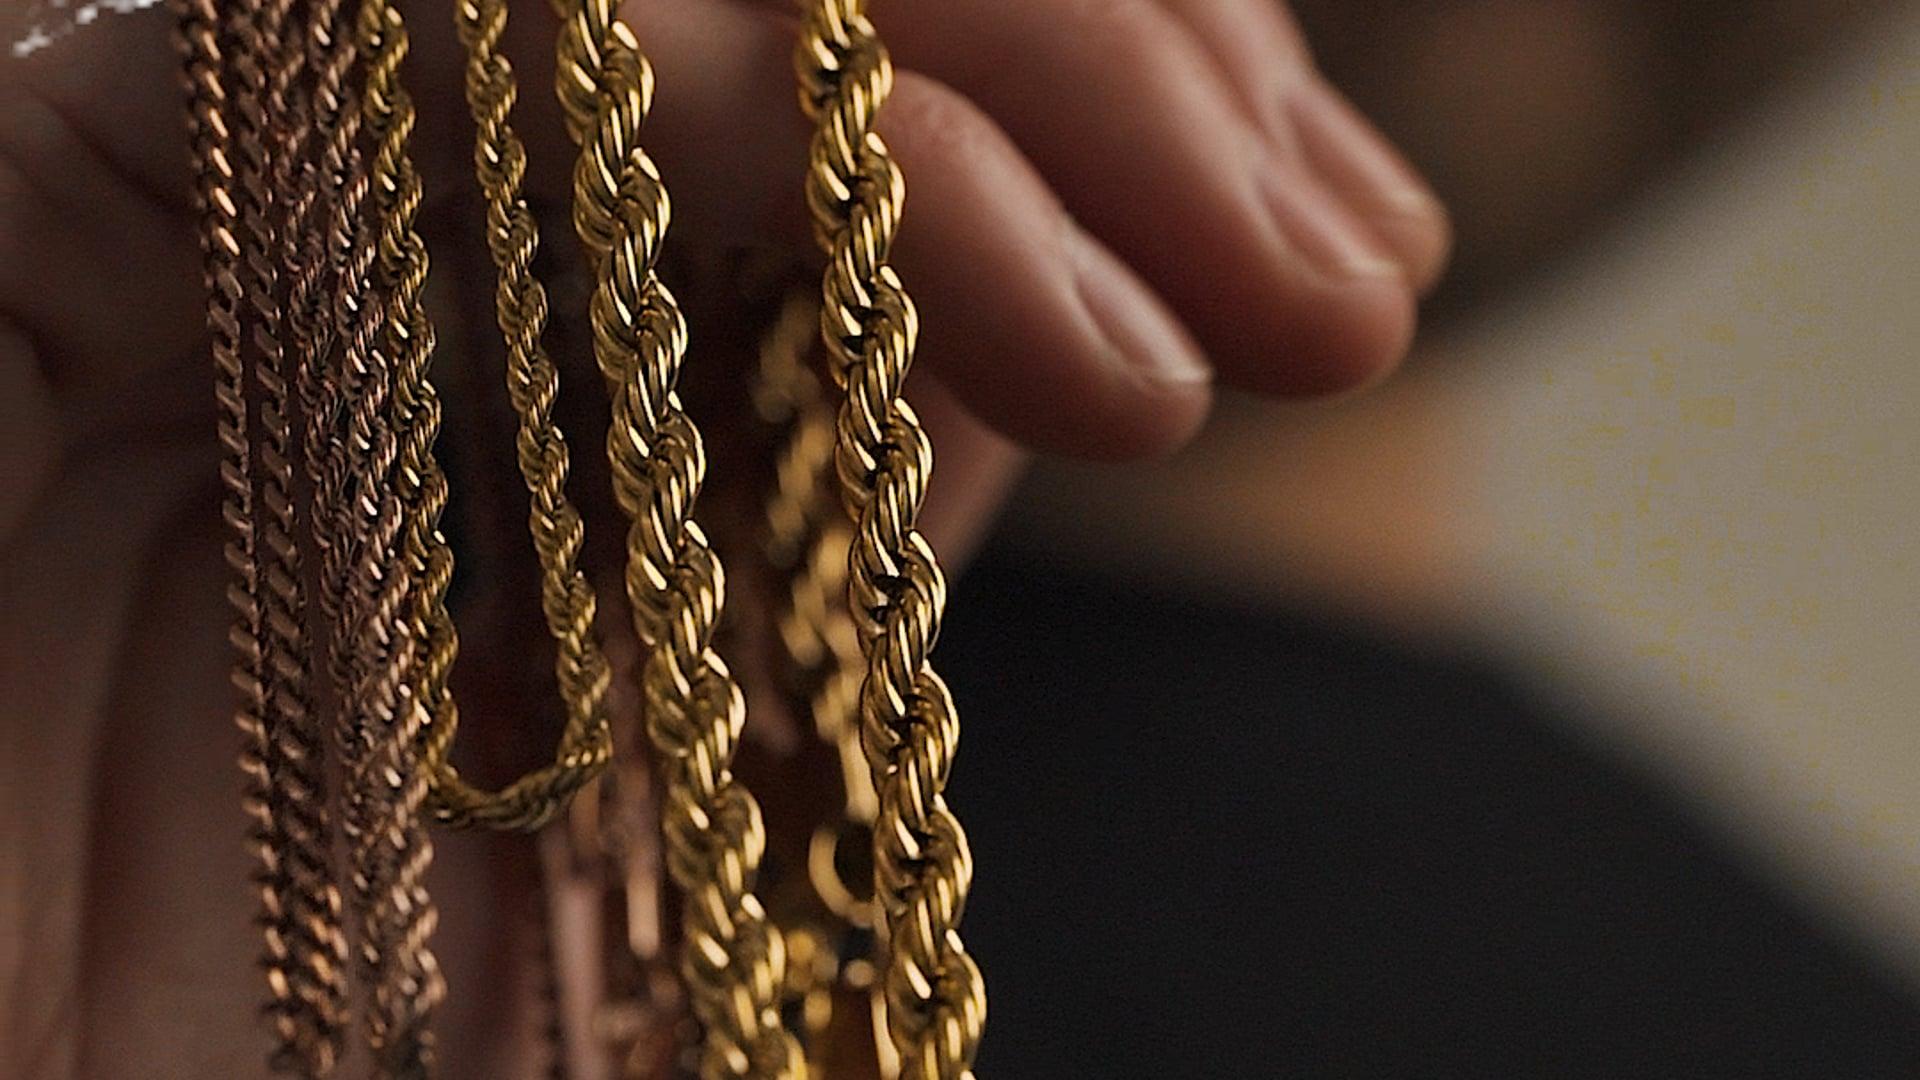 Zenchii Jewellery